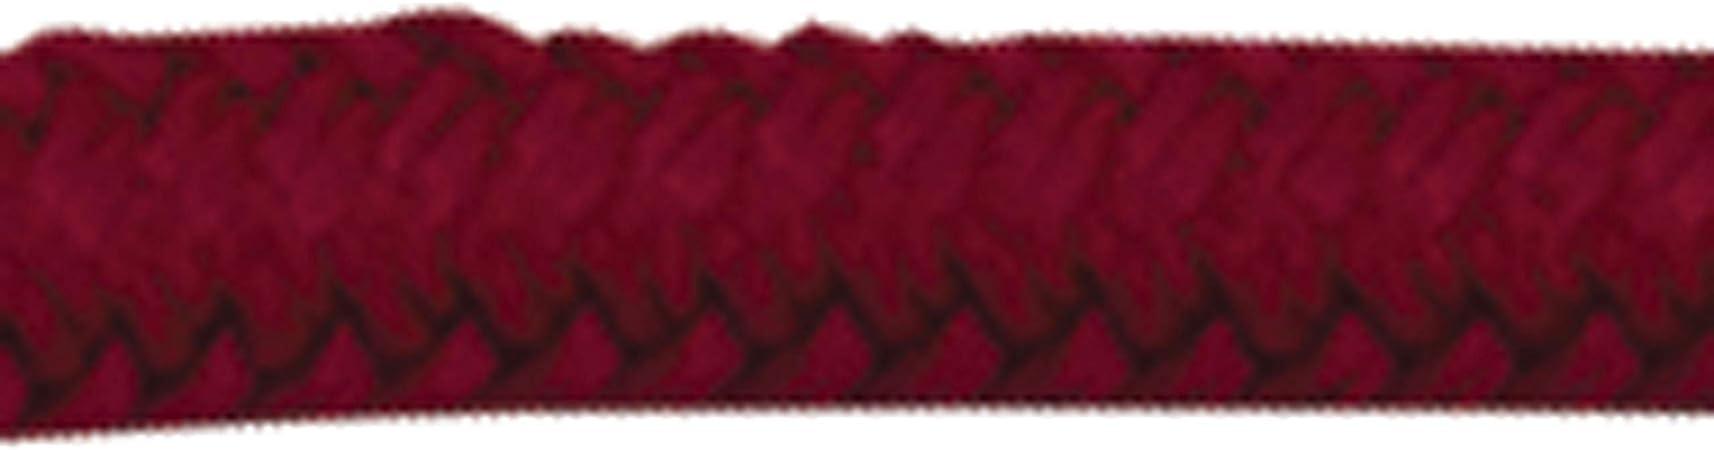 Red Sea-Dog 302110025RD-1 Premium Double Braided Nylon Dock Line 3//8 x 25